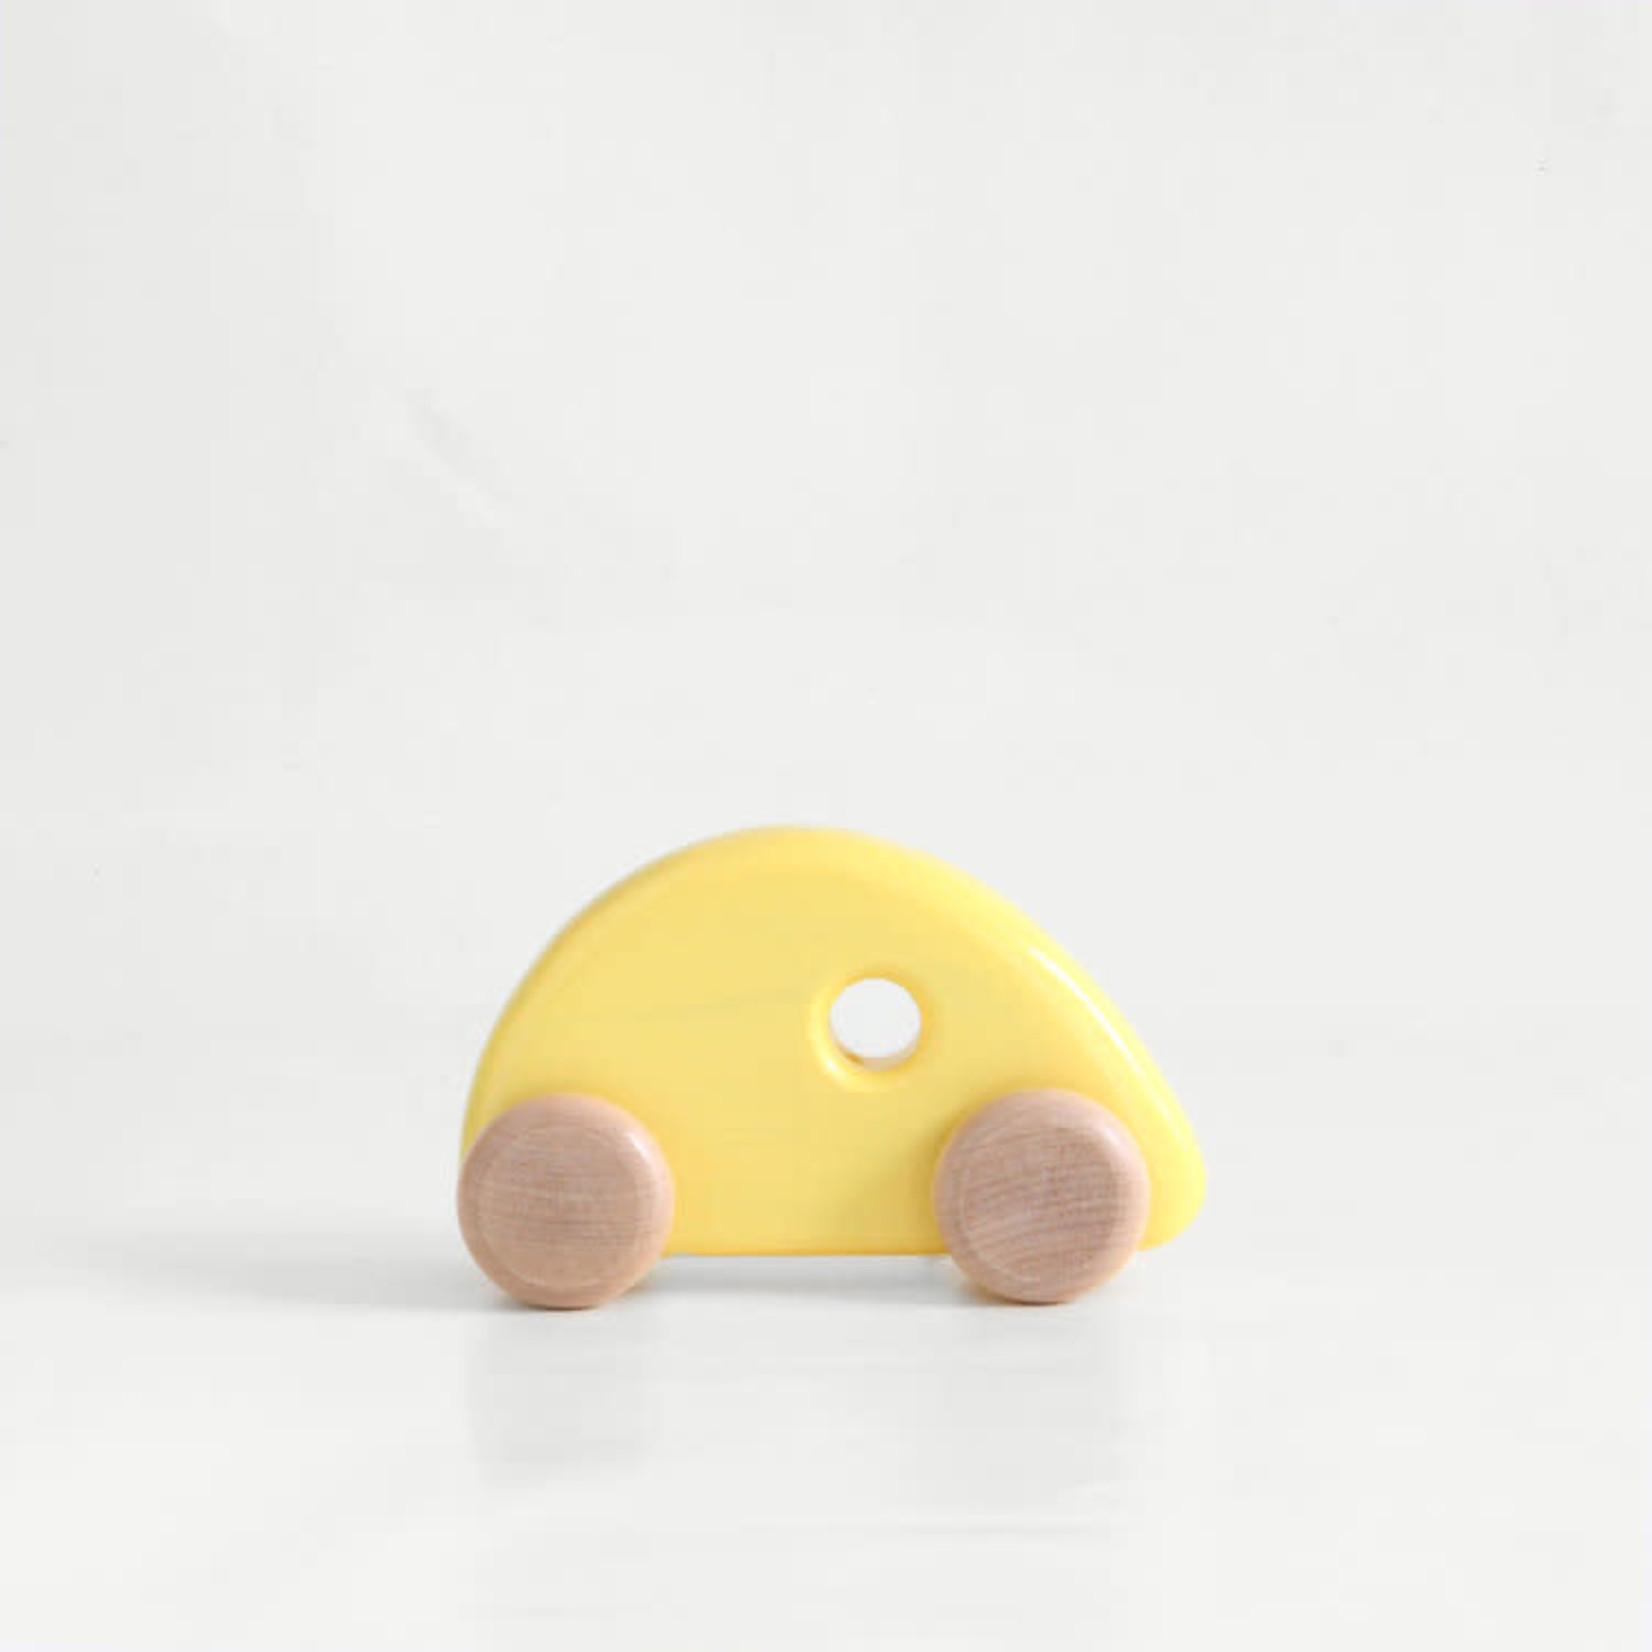 Caribou Caribou Petite voiture / jaune